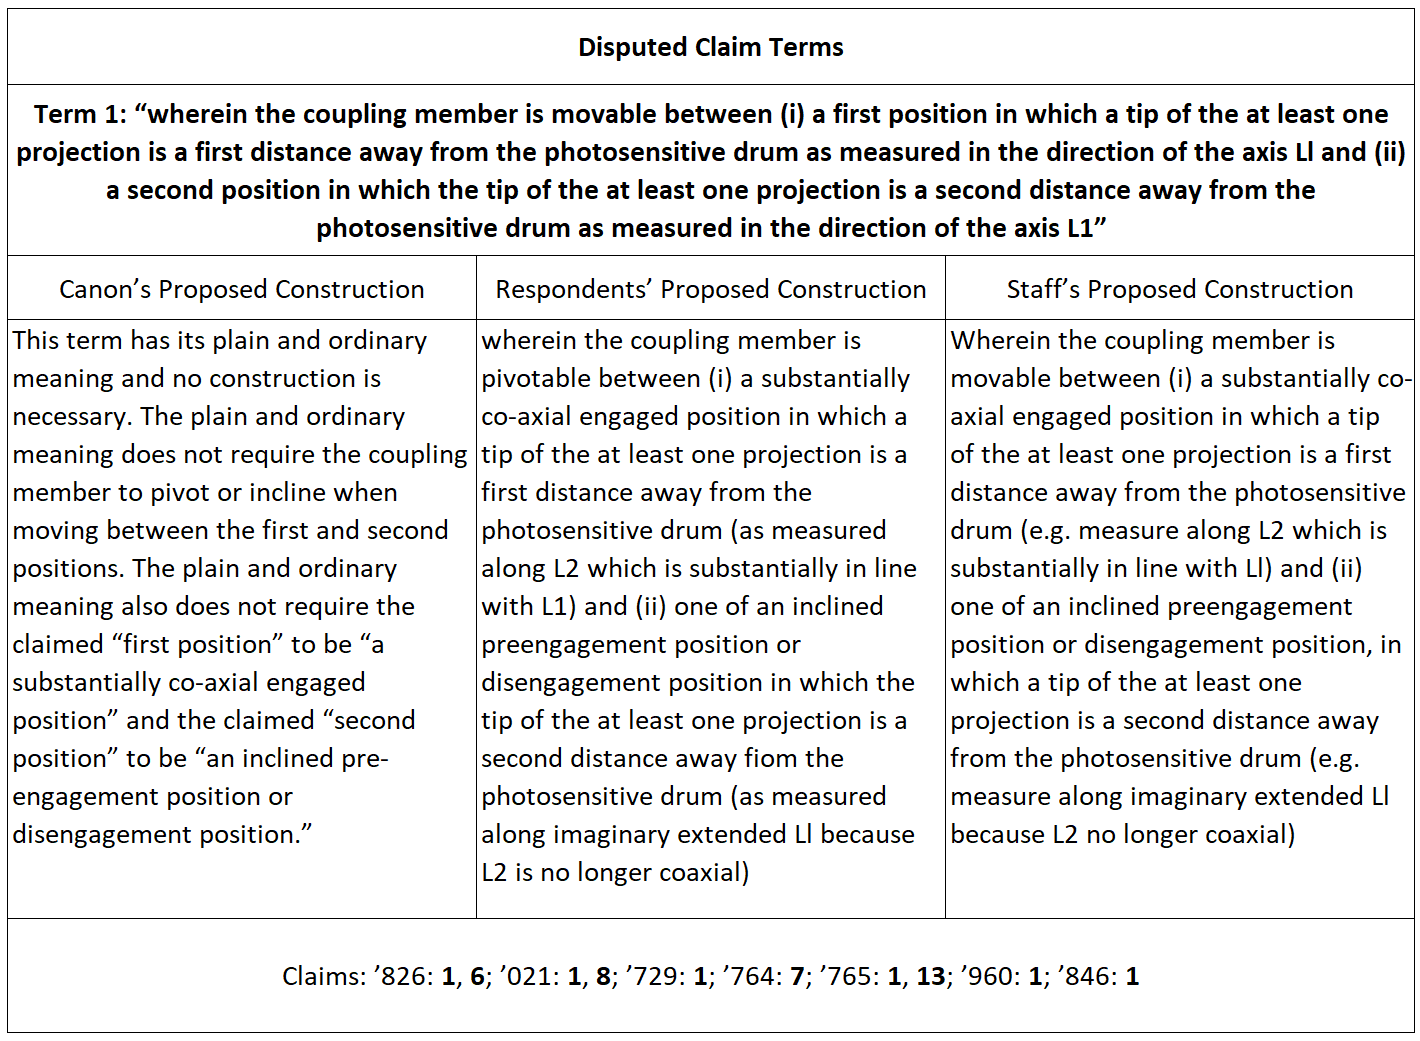 ITC 1106 Disputed Claim Terms_1